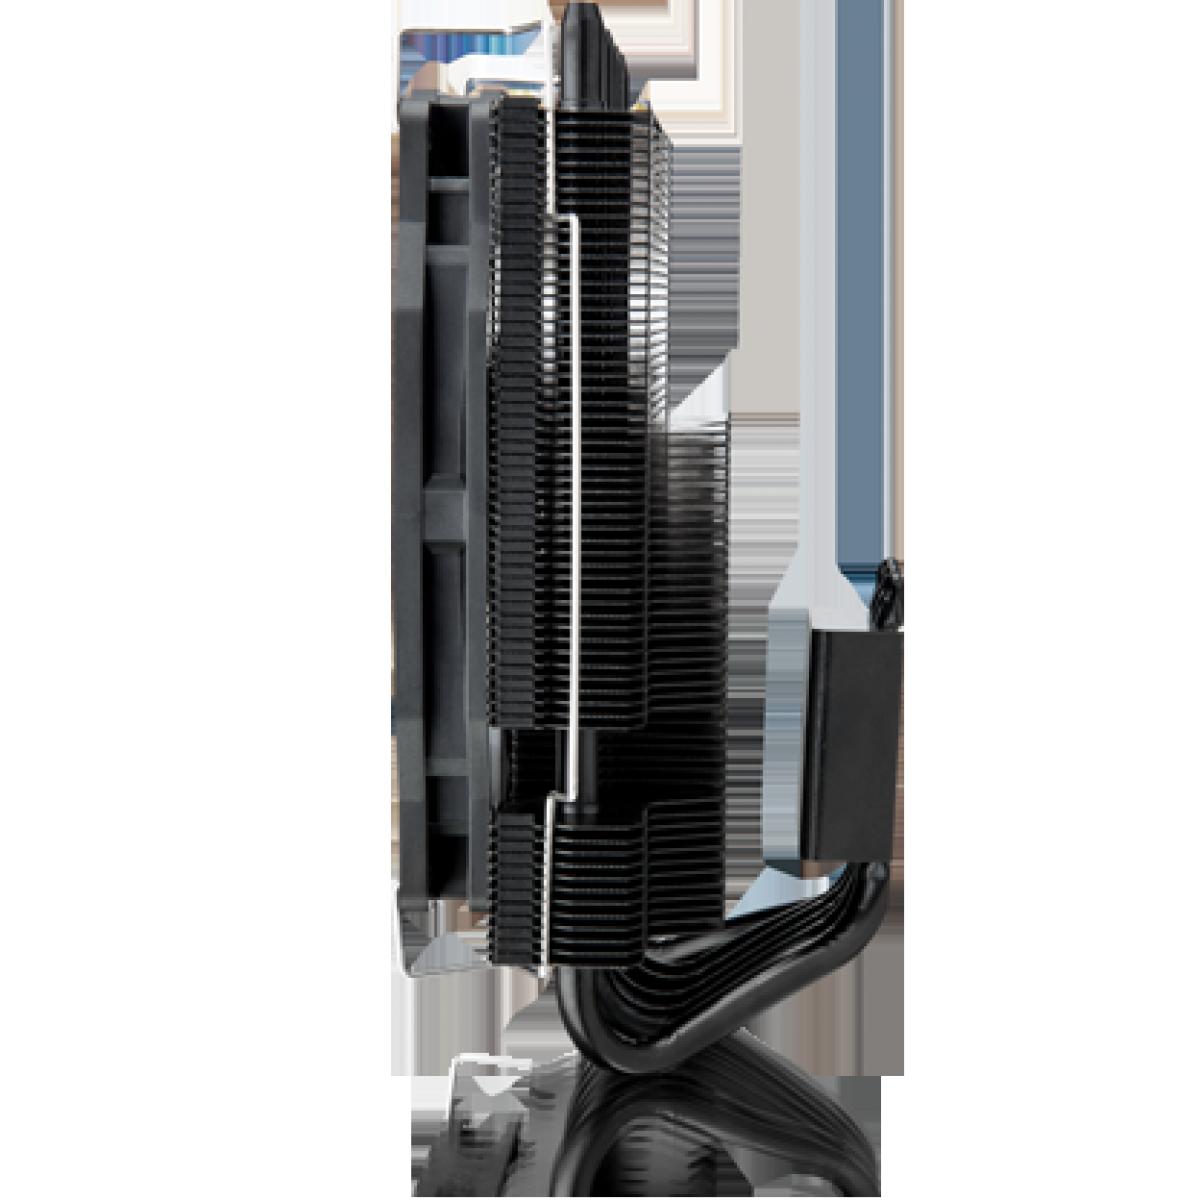 Cooler para Processador Raijintek Pallas 120, 120mm, Intel-AMD, 0R10B00095